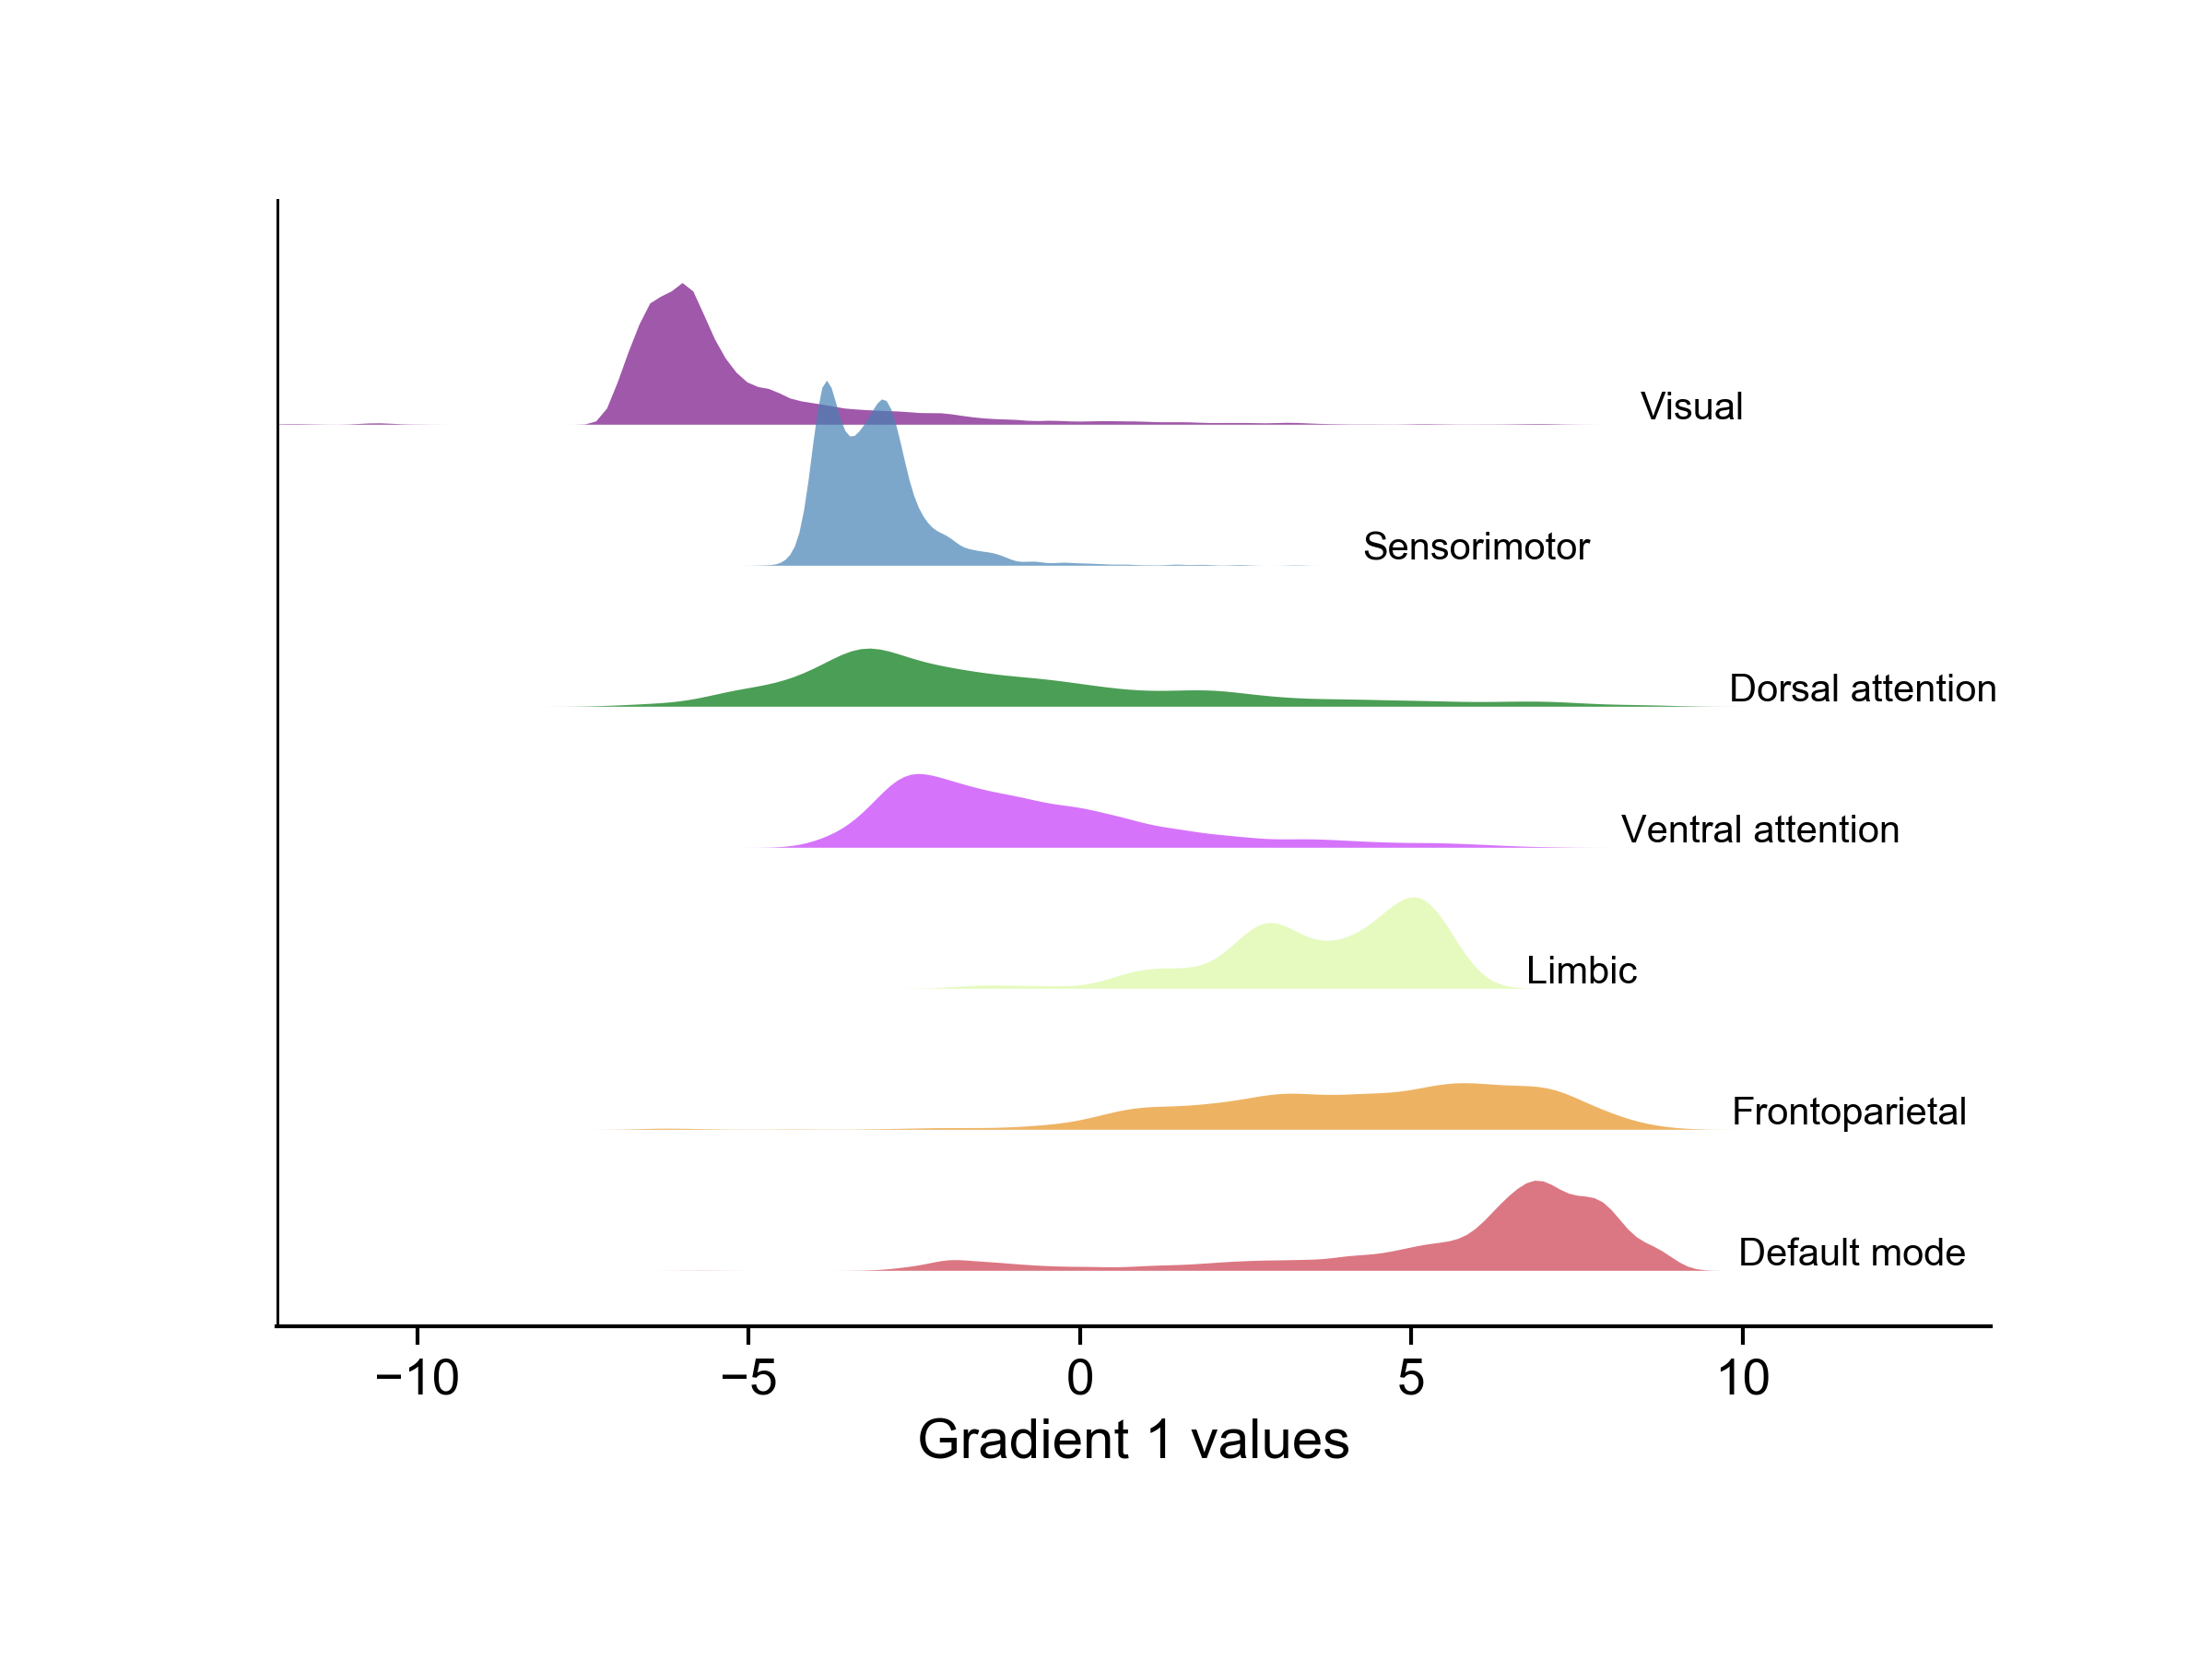 reports/figures/CCA/niftis/common_regions_gradient.png